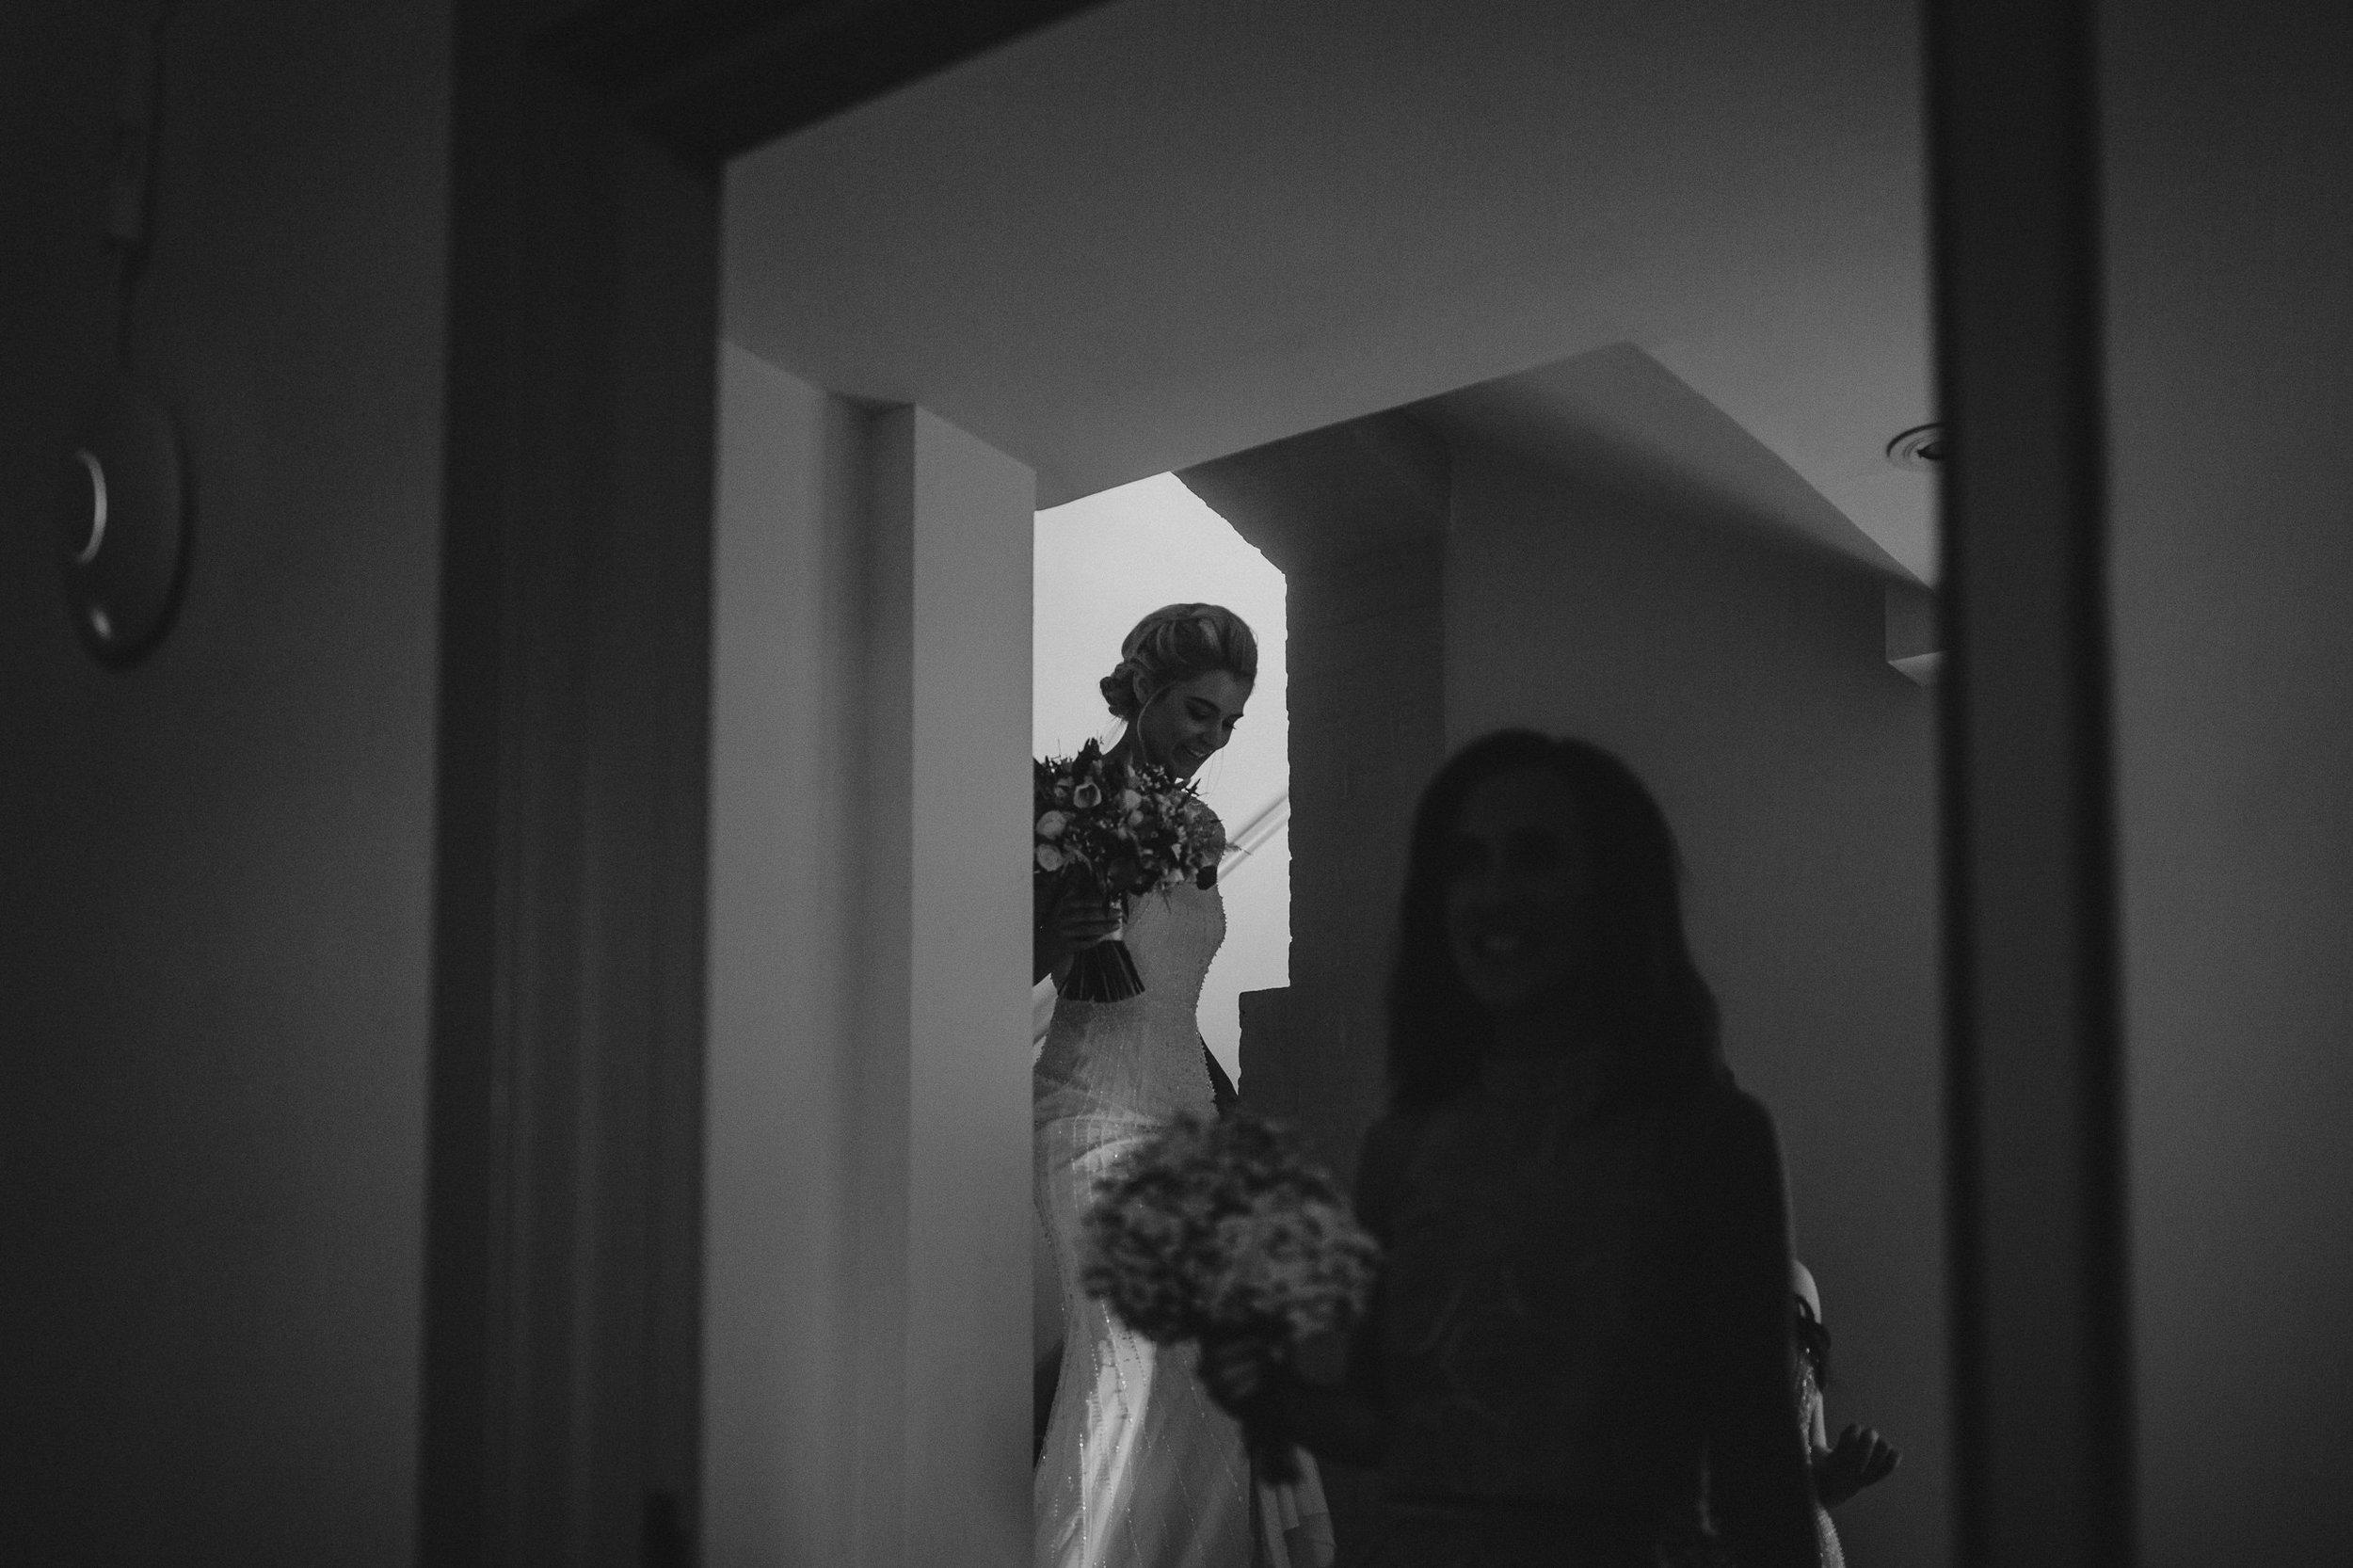 London_wedding_photographer_gione_da_silva_carelle_paul104.jpg